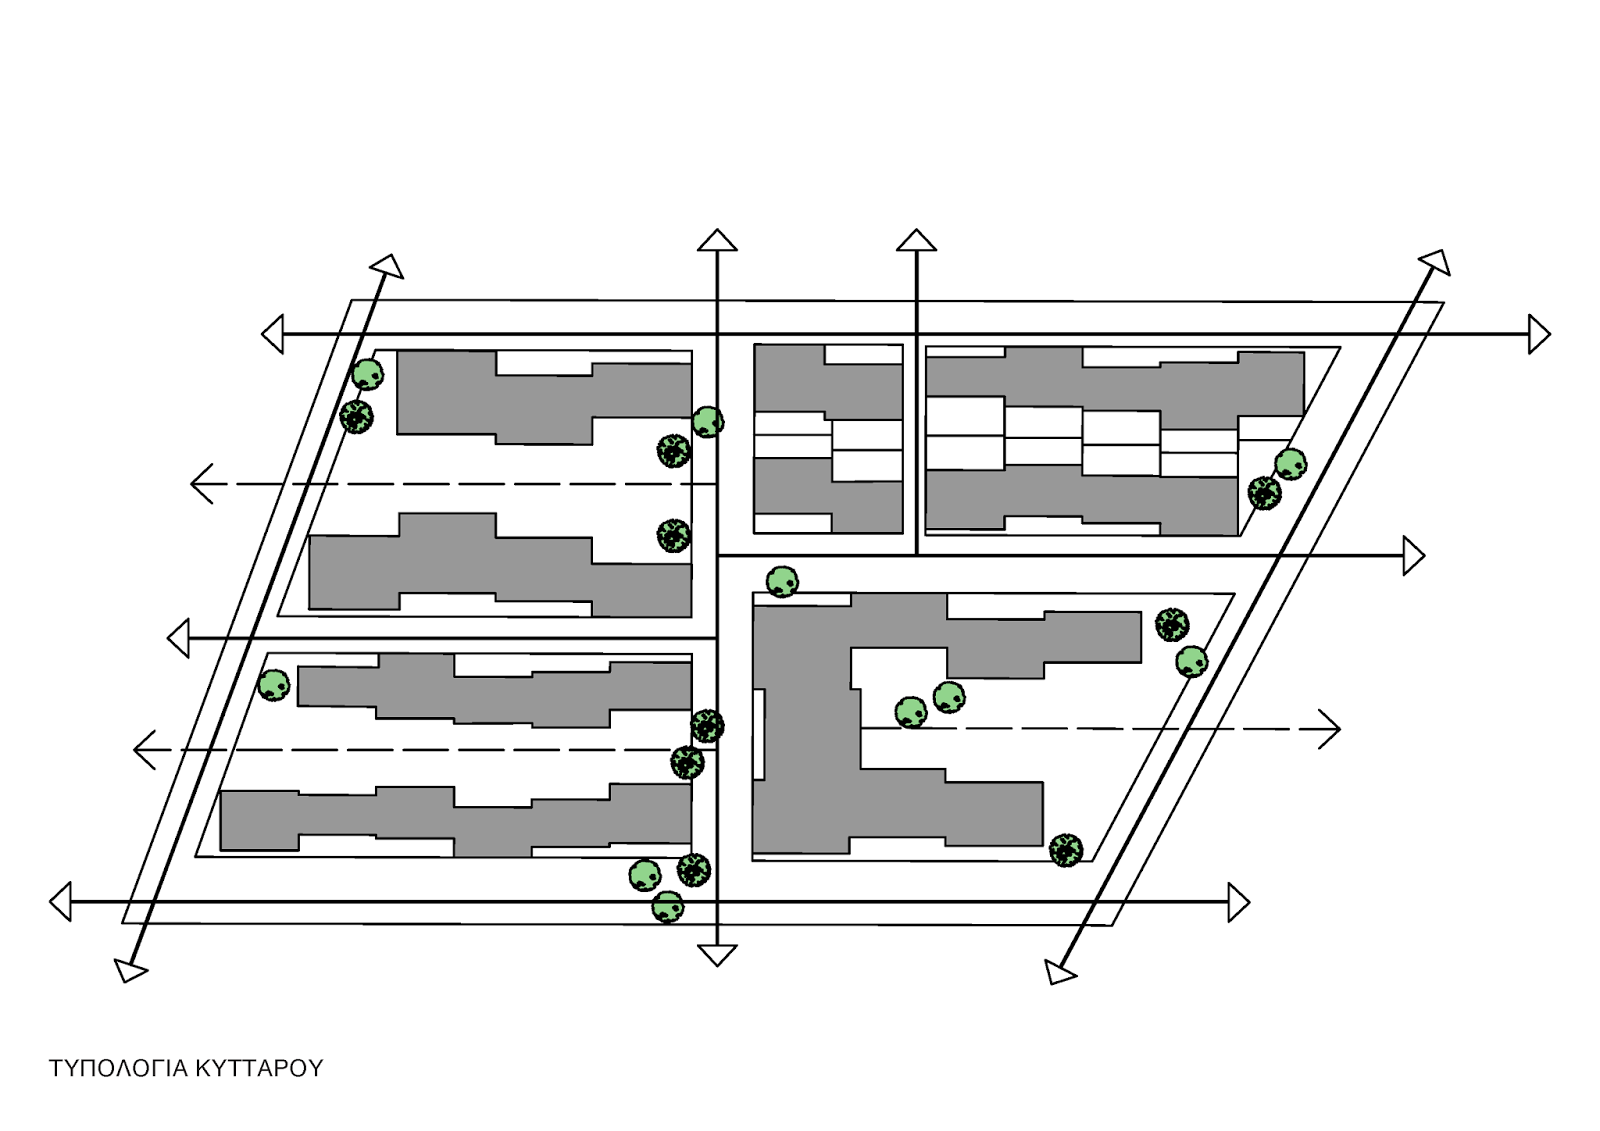 daewoo leganza audio wiring diagram auto daewoo auto